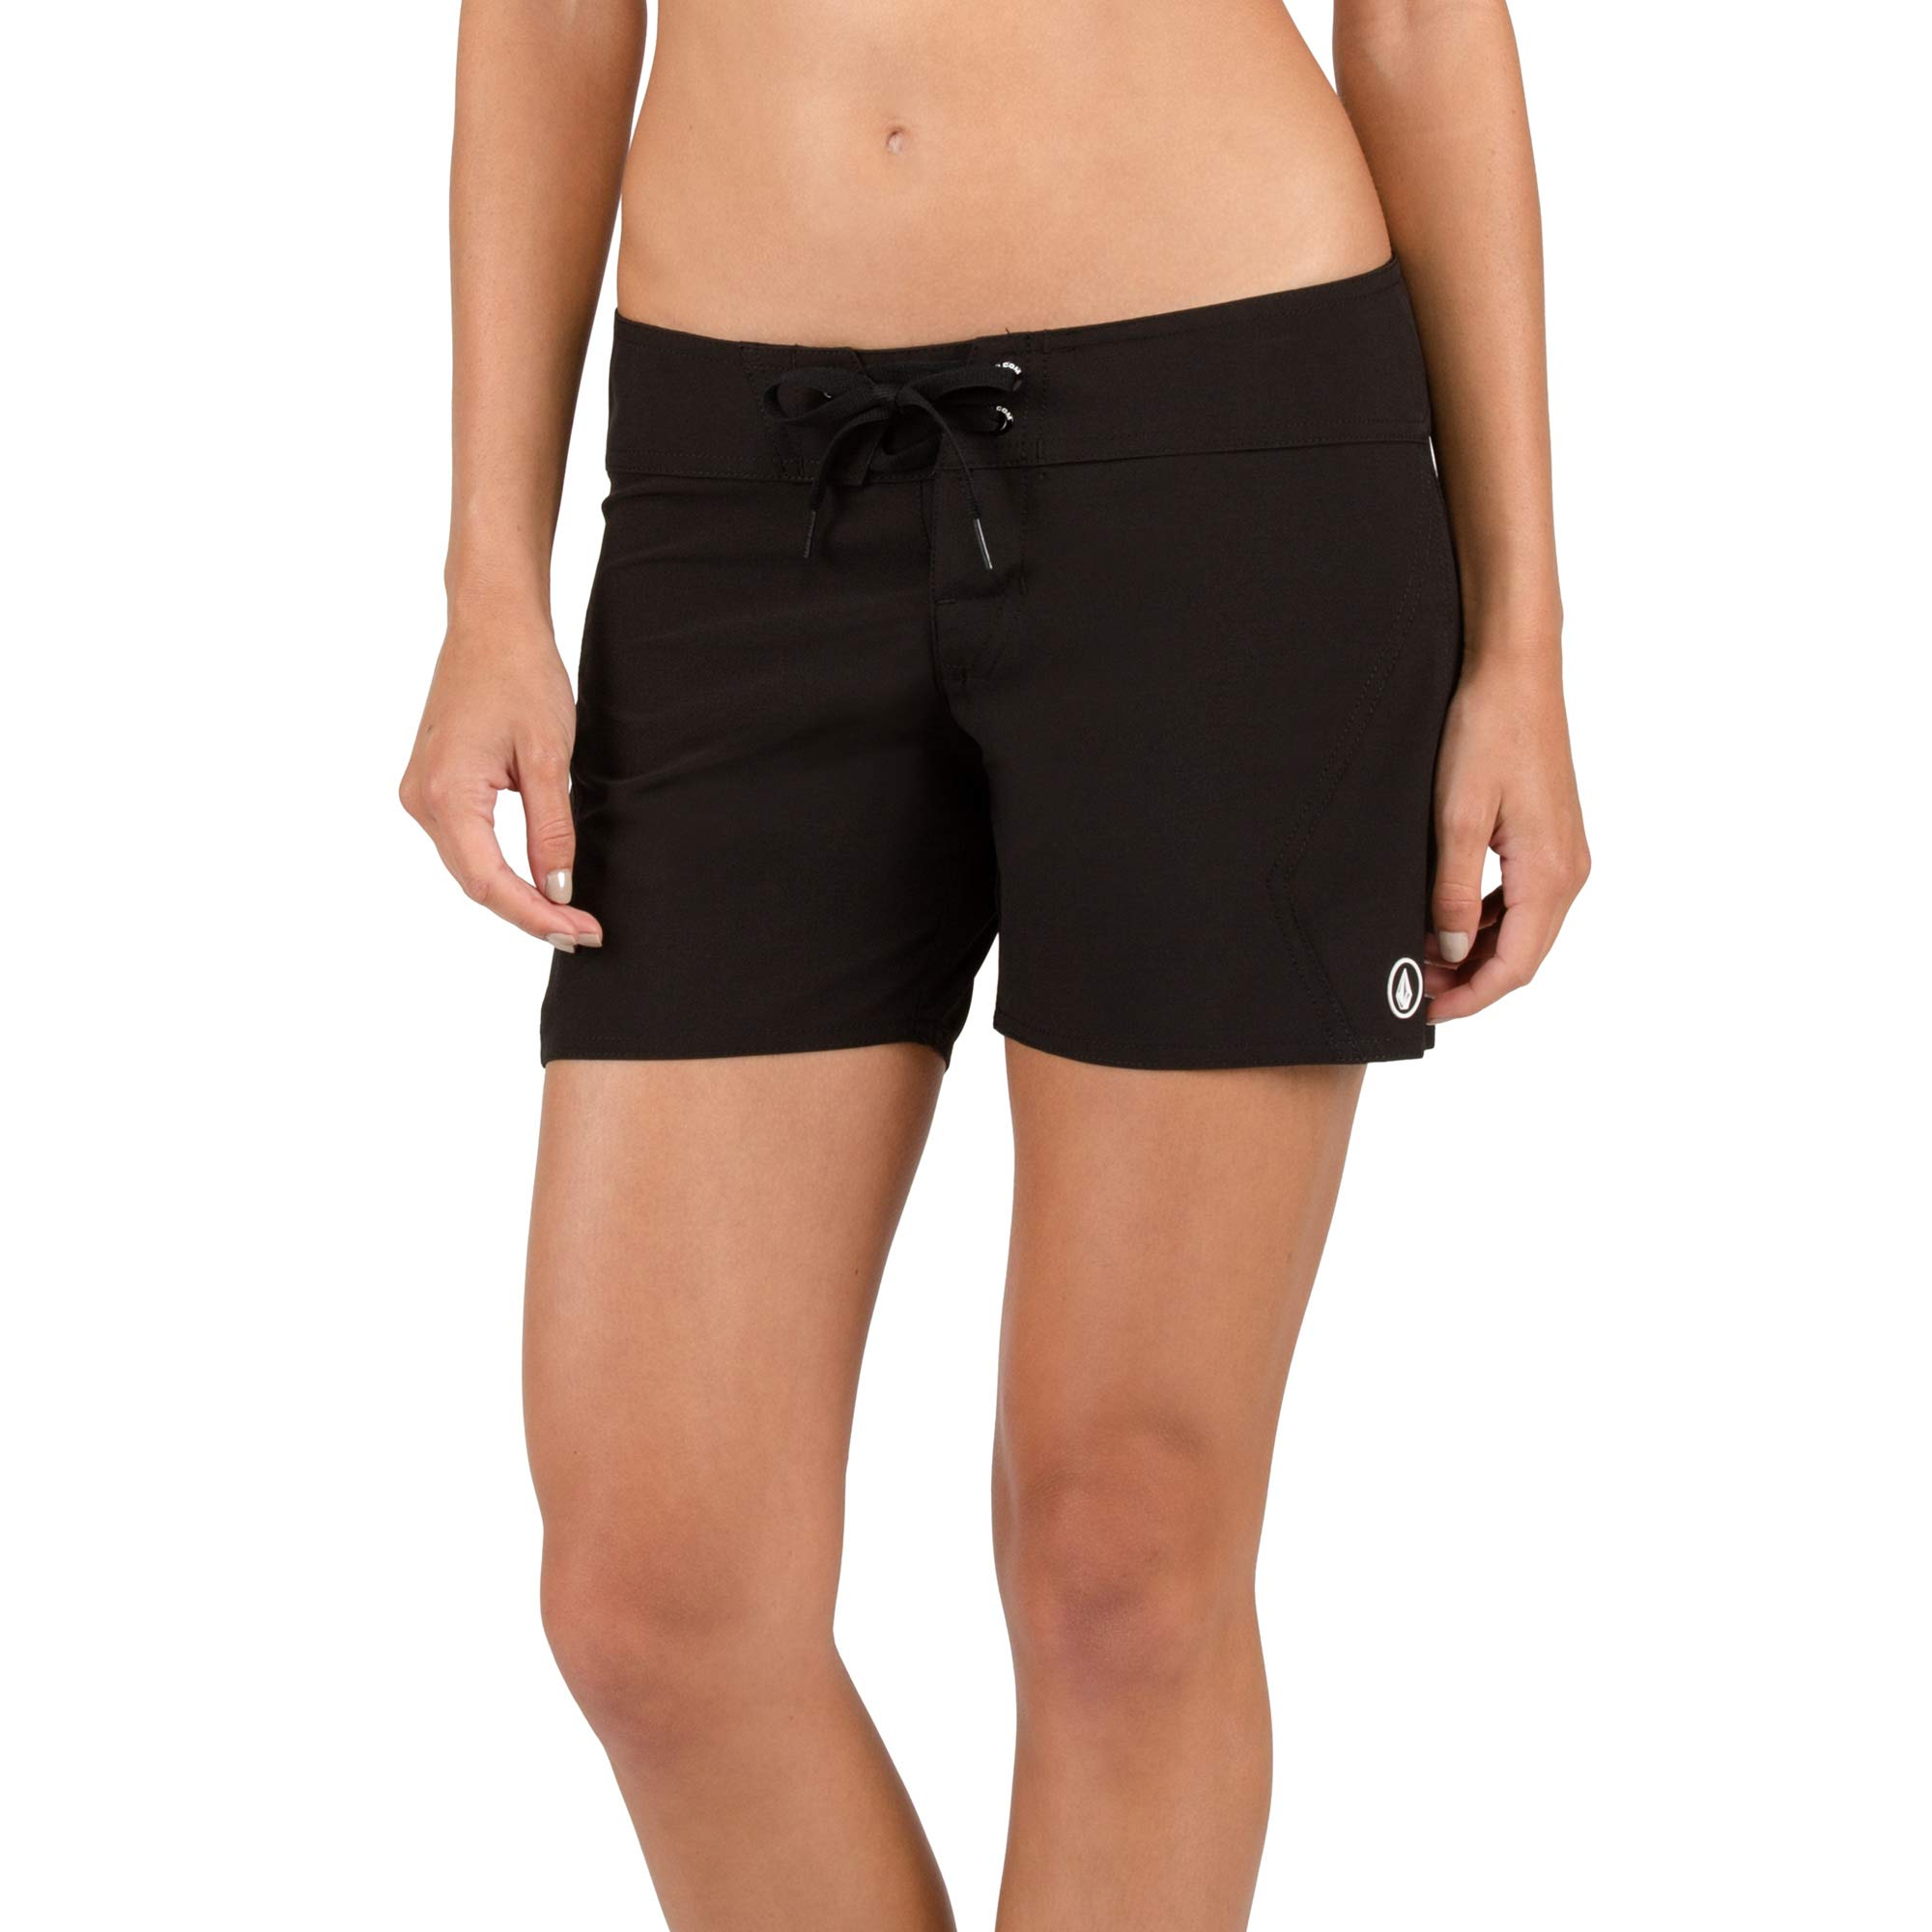 Volcom Women's Simply Solid 5 Inch Boardshort, Black, 13 by Volcom